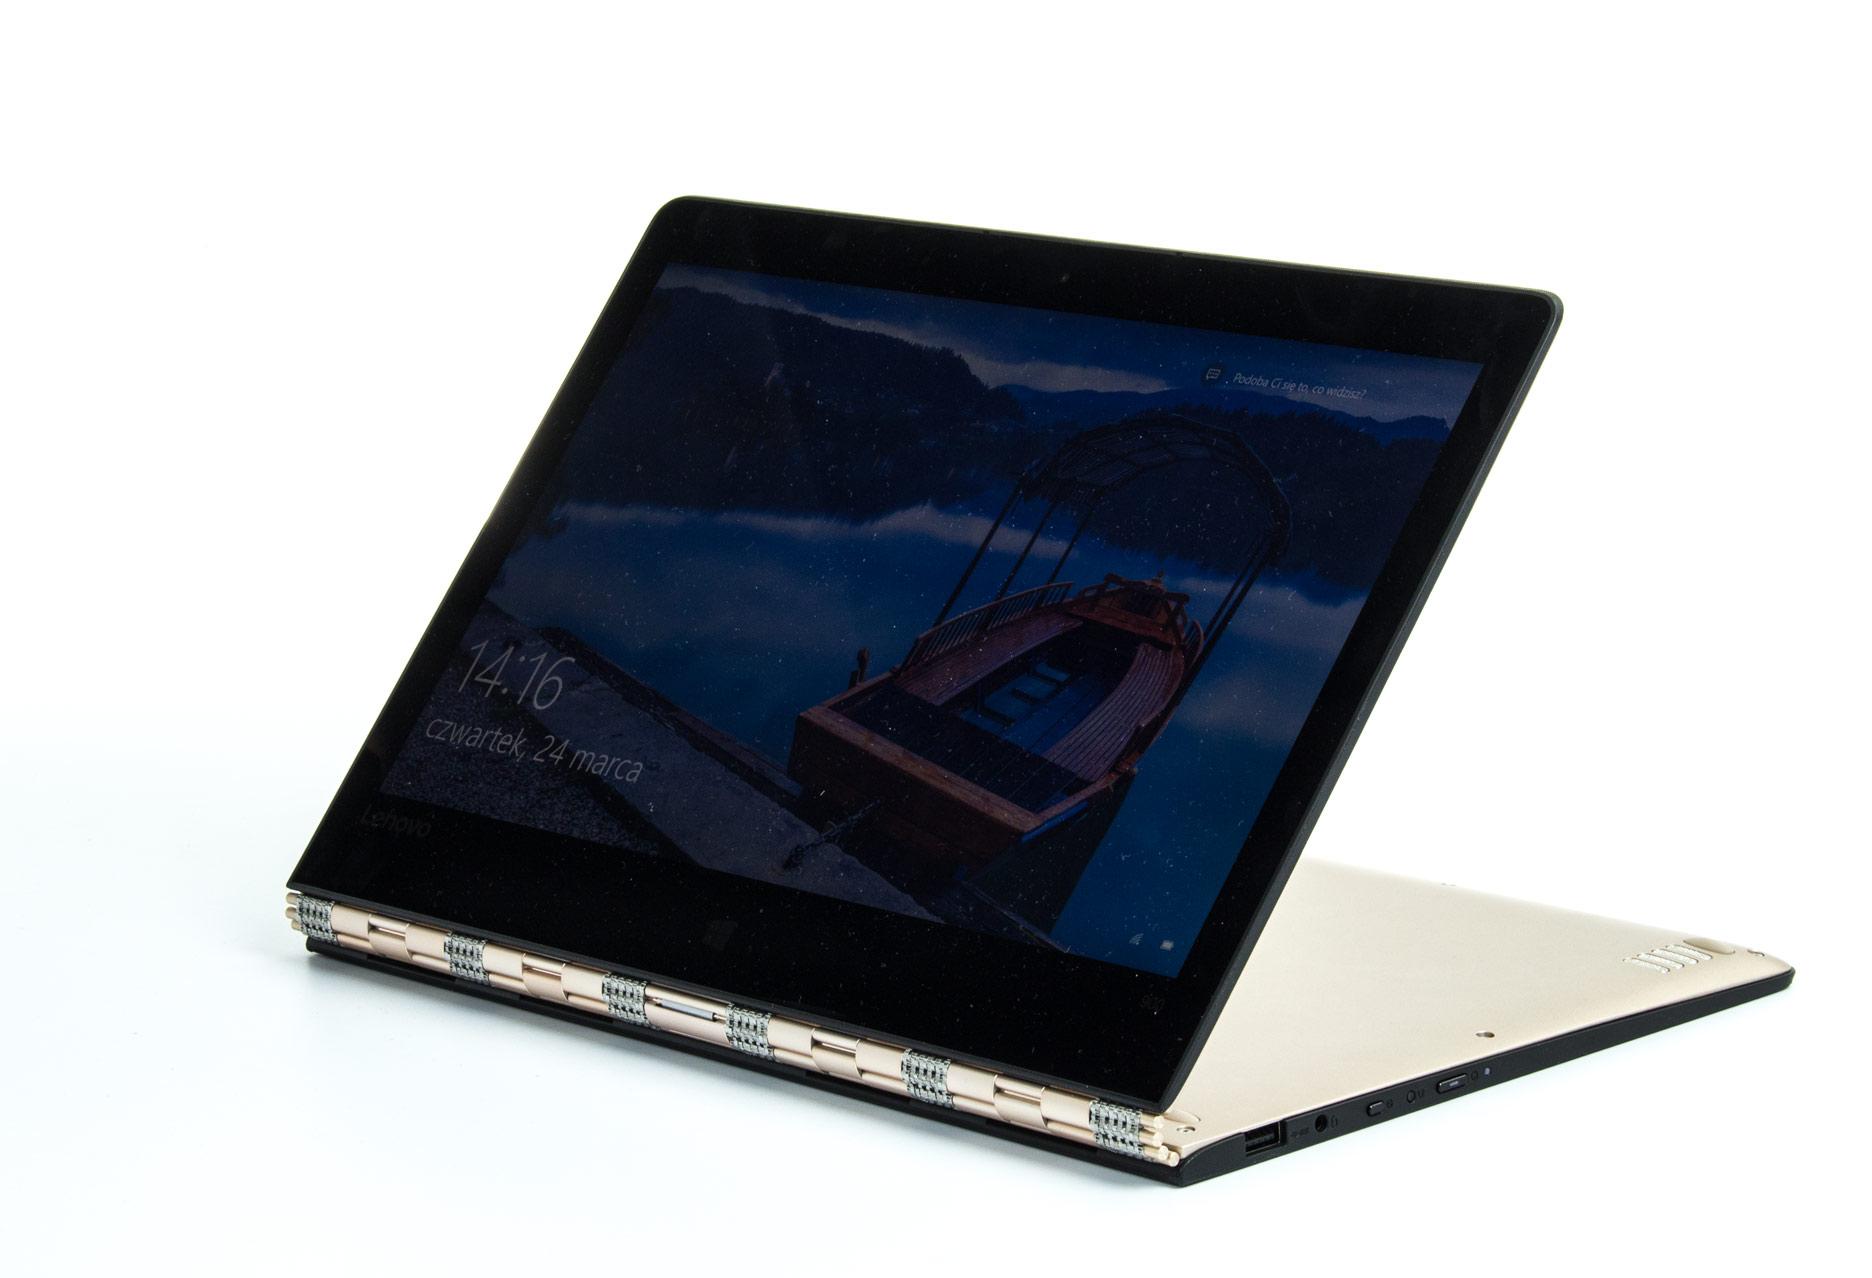 Lenovo Yoga 900 tryb kinowy